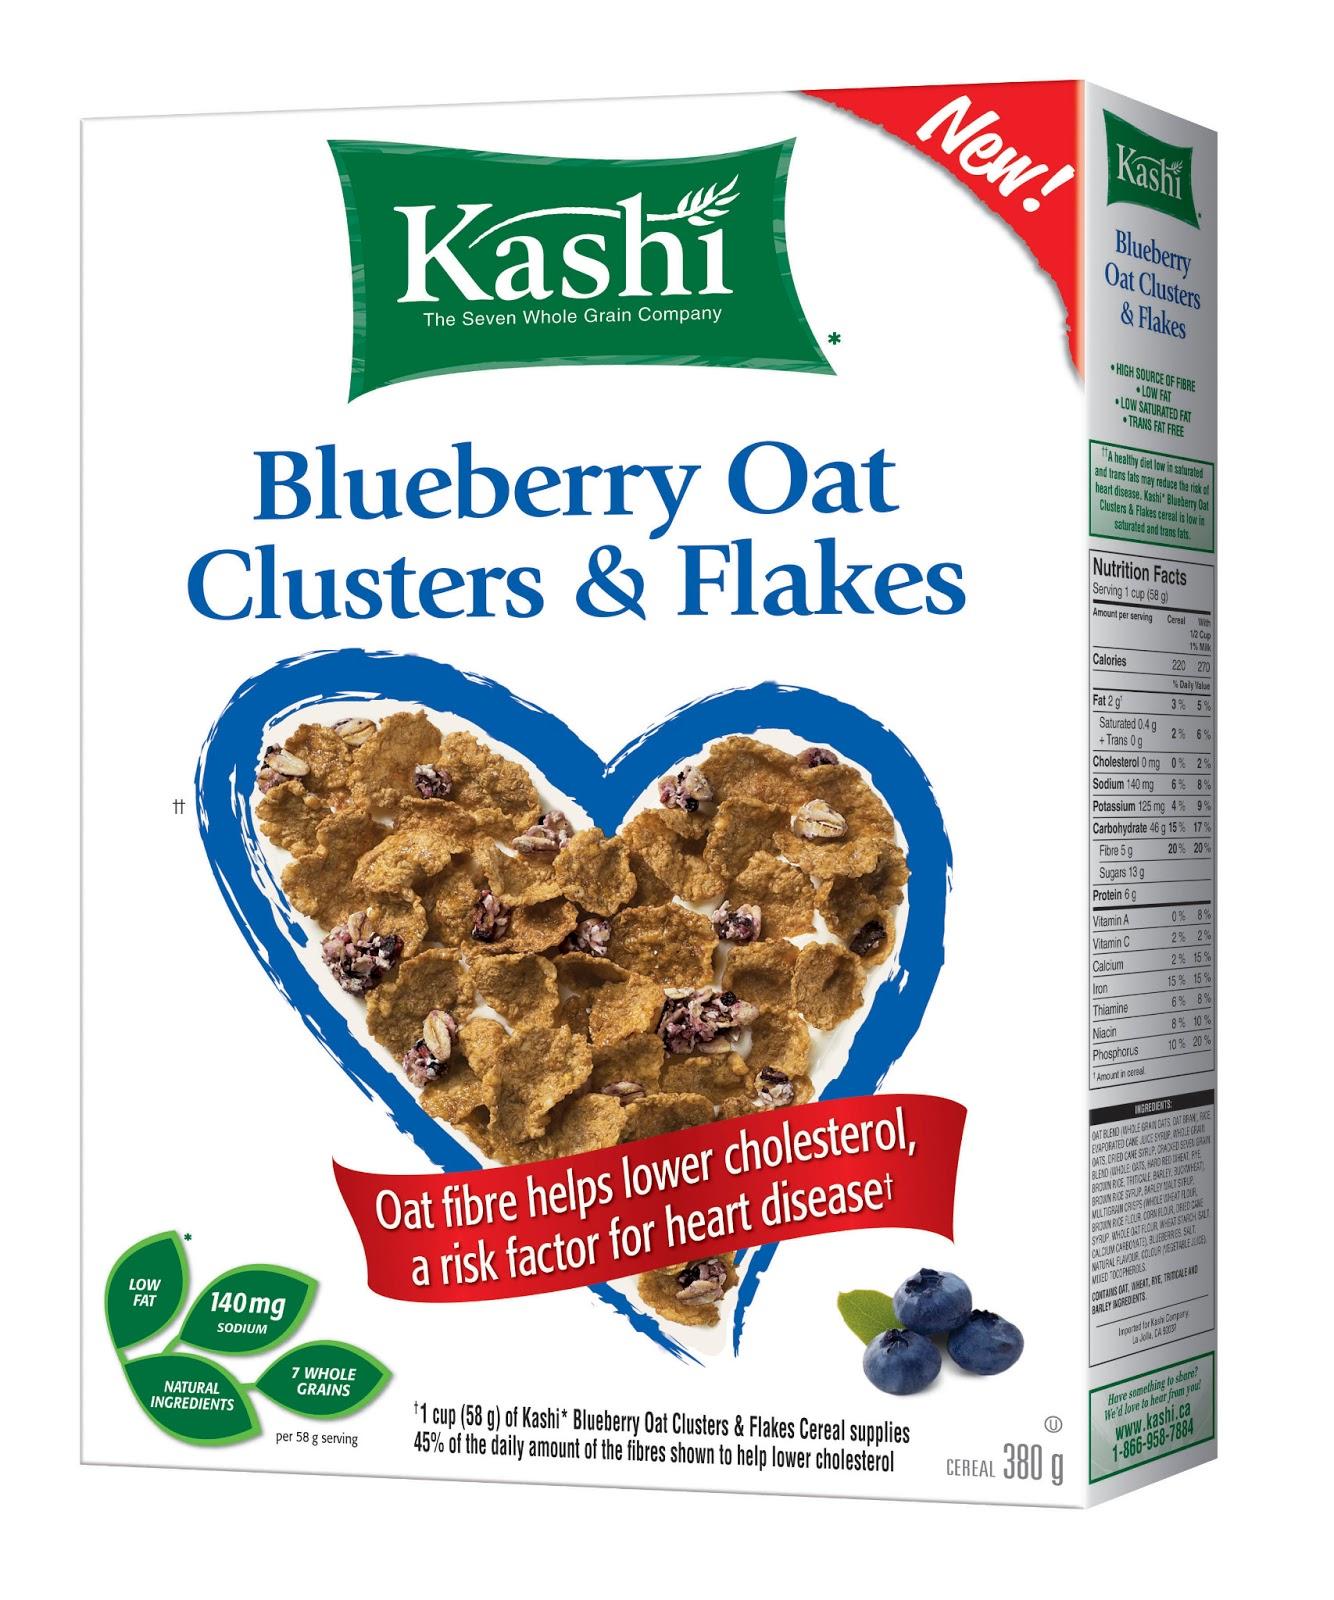 Spokesmama: Kashi Blueberry Cereal